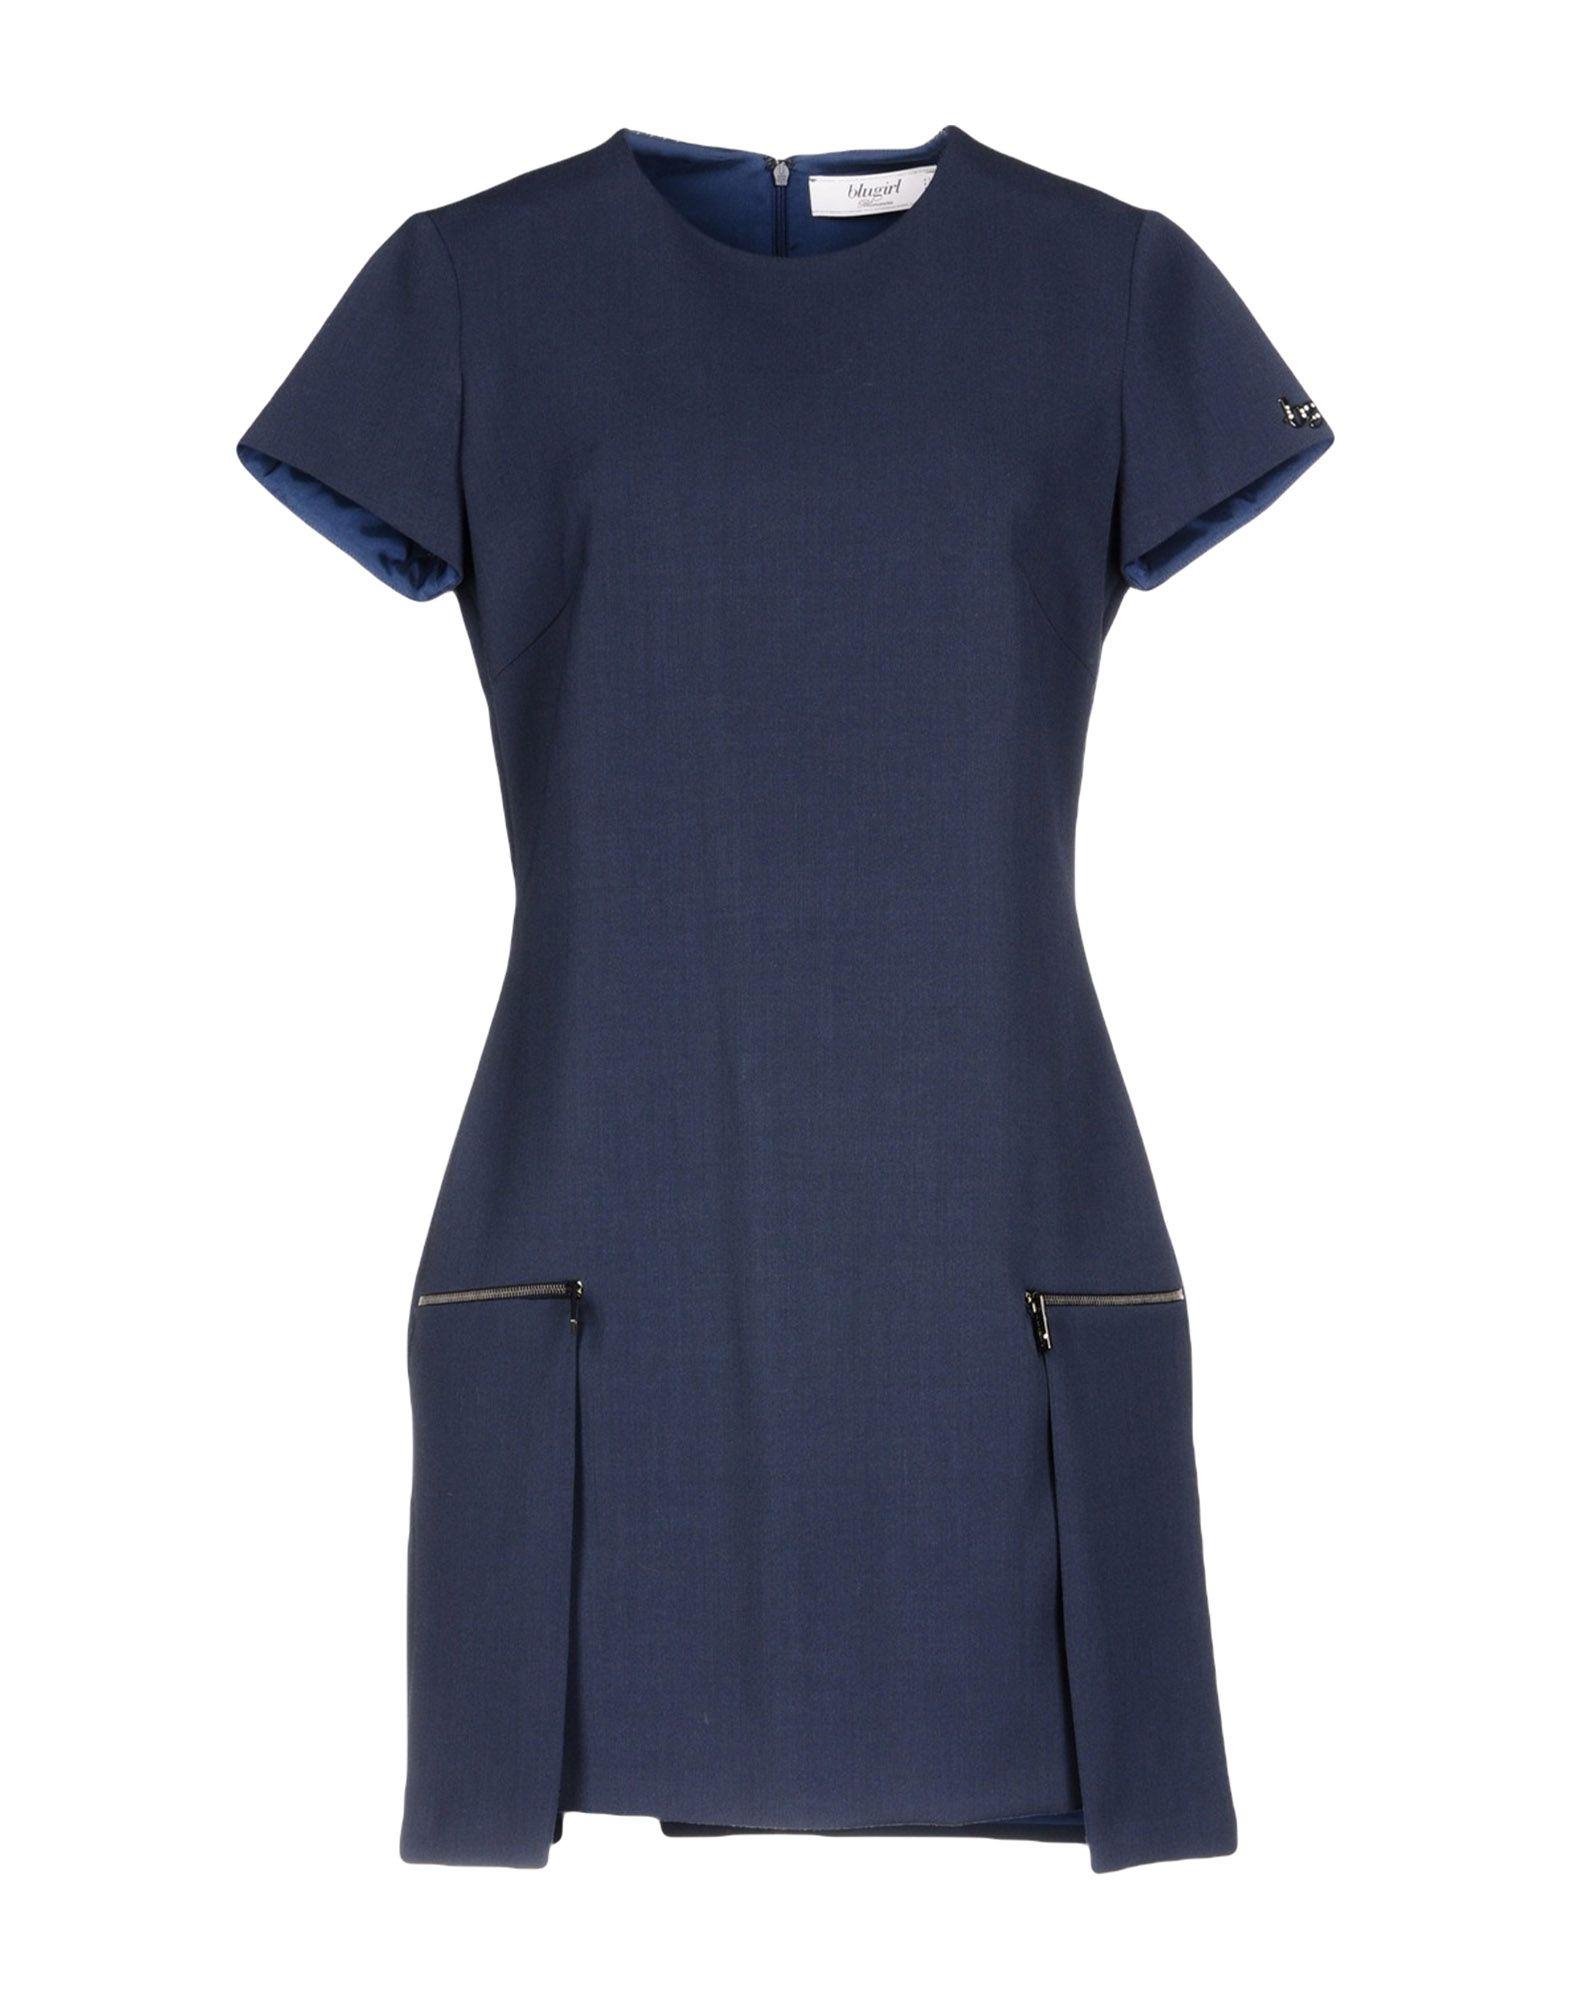 Vestito Corto Blugirl Blumarine Donna - Acquista online su YELjb